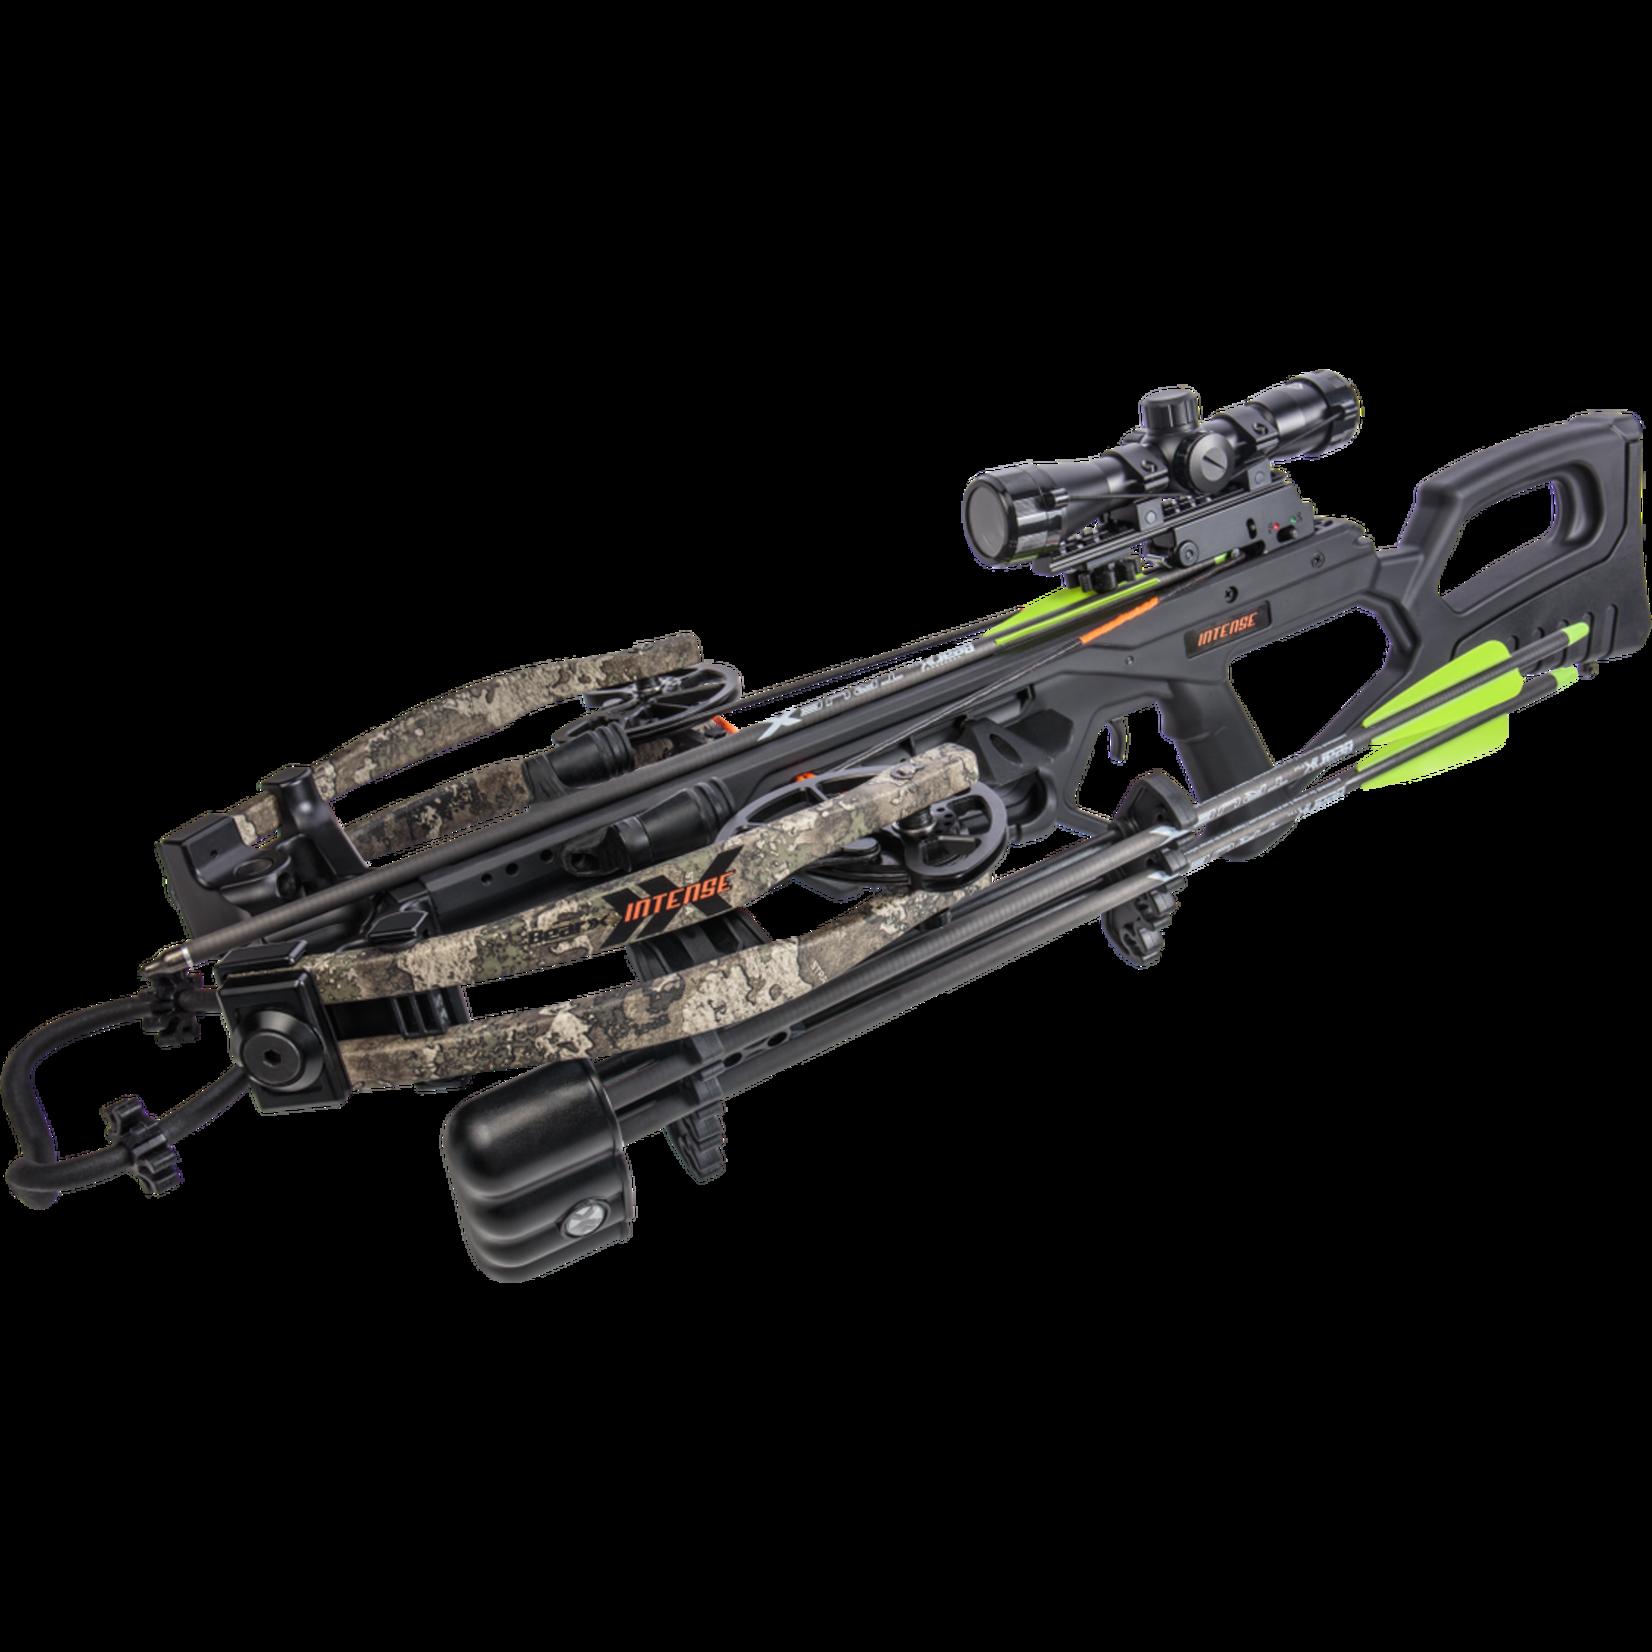 Bear Archery Intense Strata Crossbow Kit 400fps